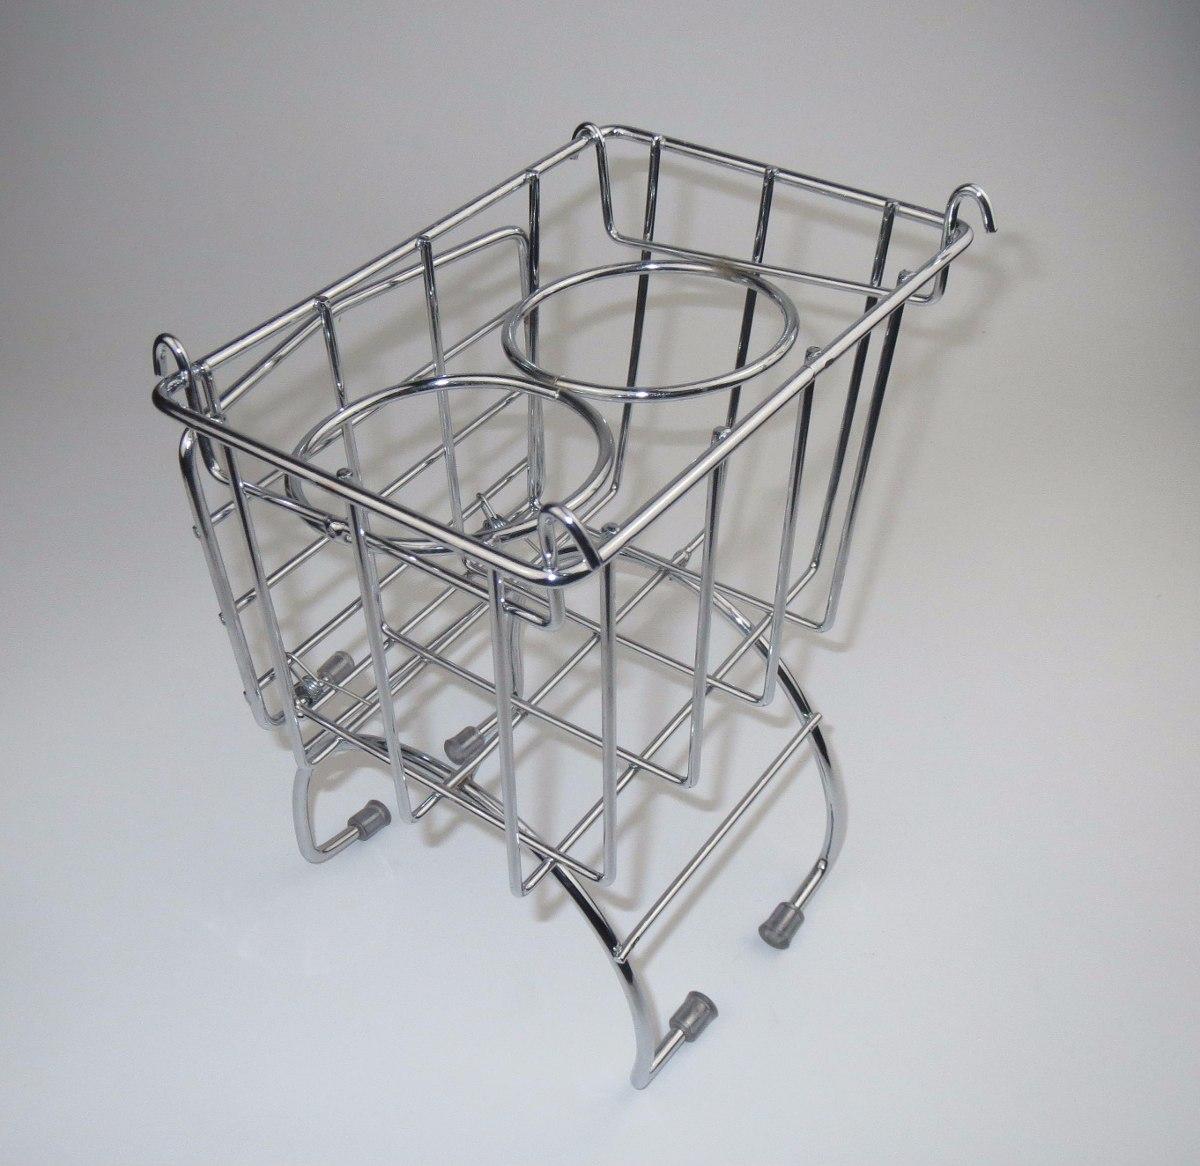 Console porta copos treco cesto cestinha metal cromado for Metal cromado